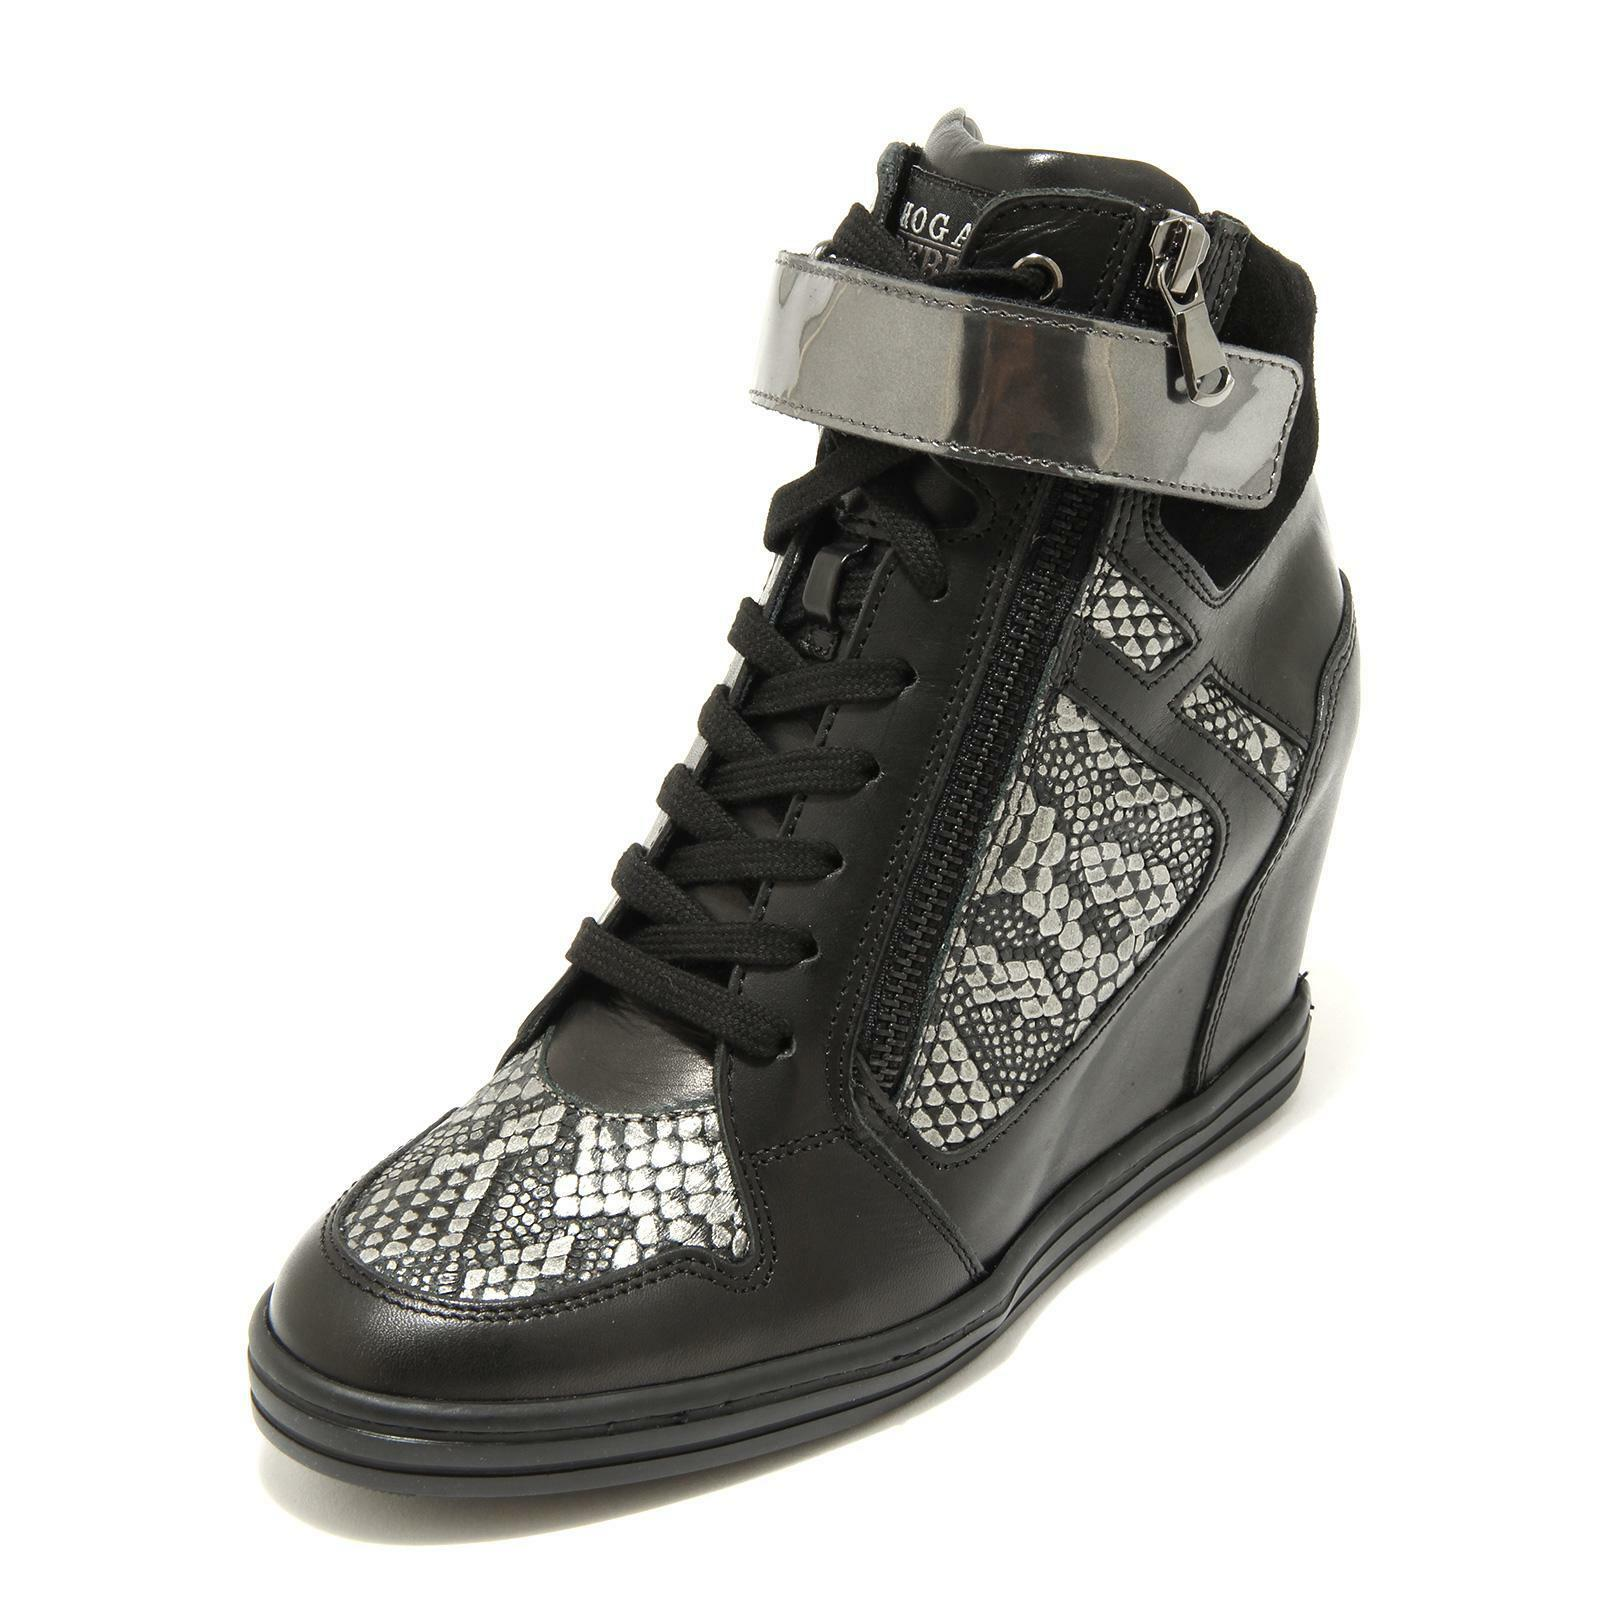 4479G tenis mujer negro gris HOGAN Rebel Rebel Rebel R 199 Cremallera Lateral Scarpa Zapatos Wome  barato en línea